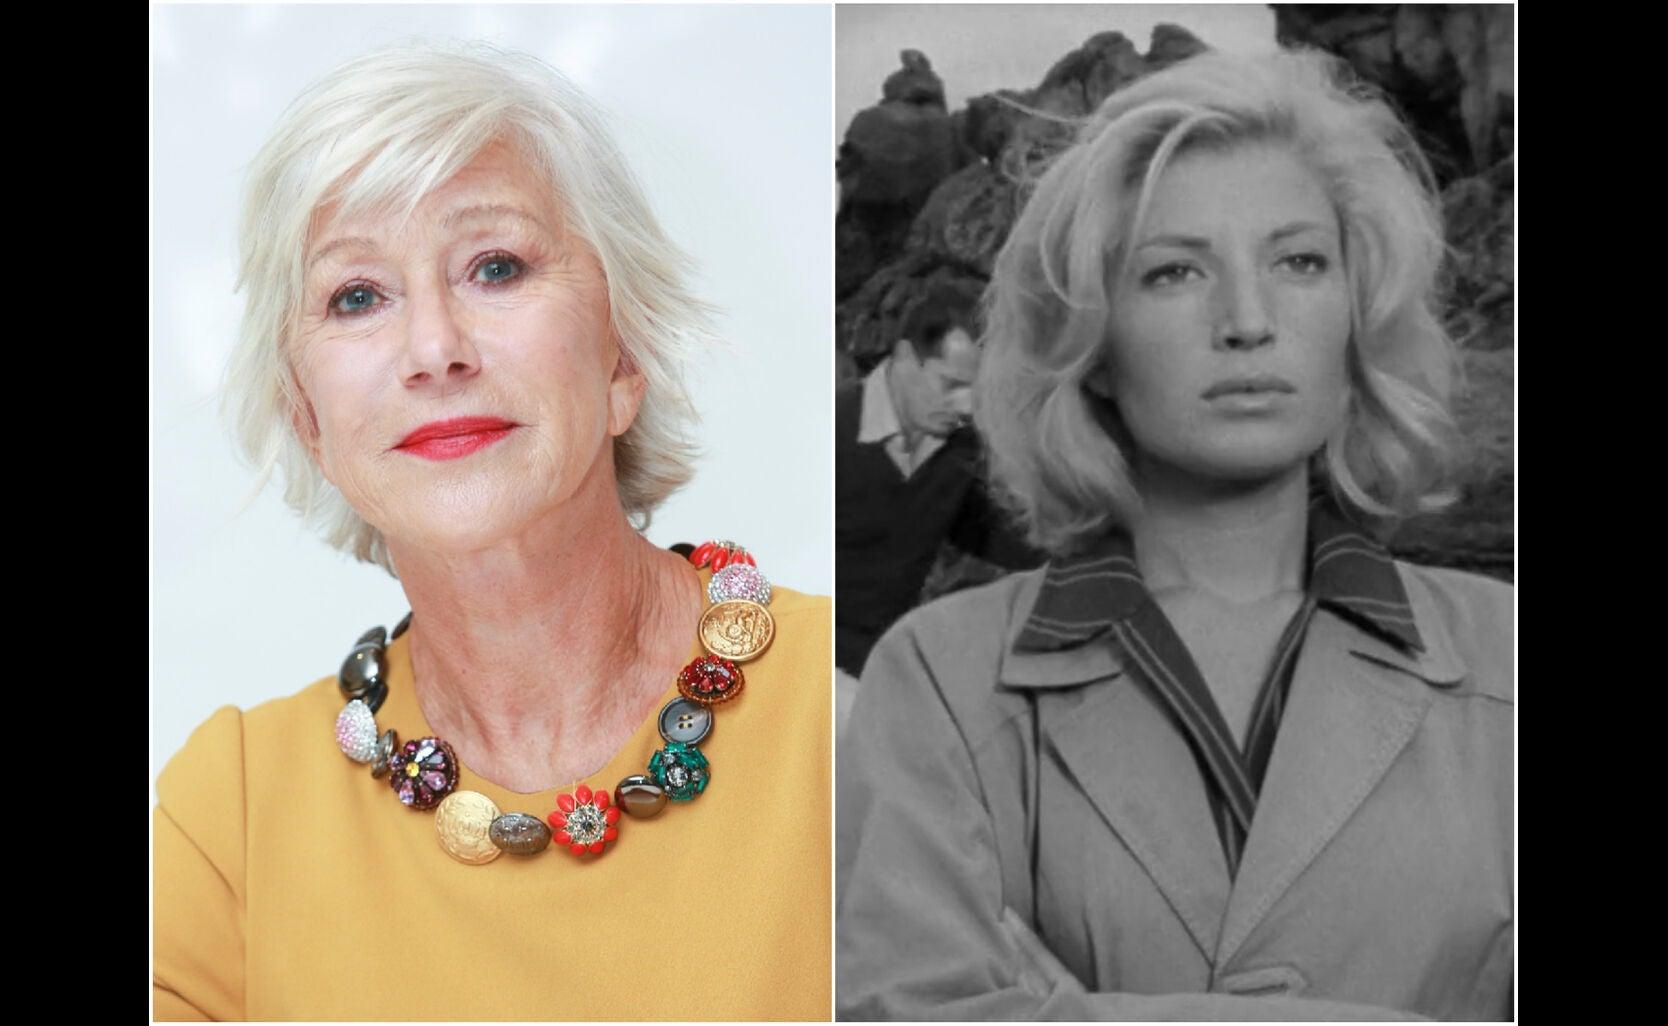 Helen Mirren and a scene from L'Avventura